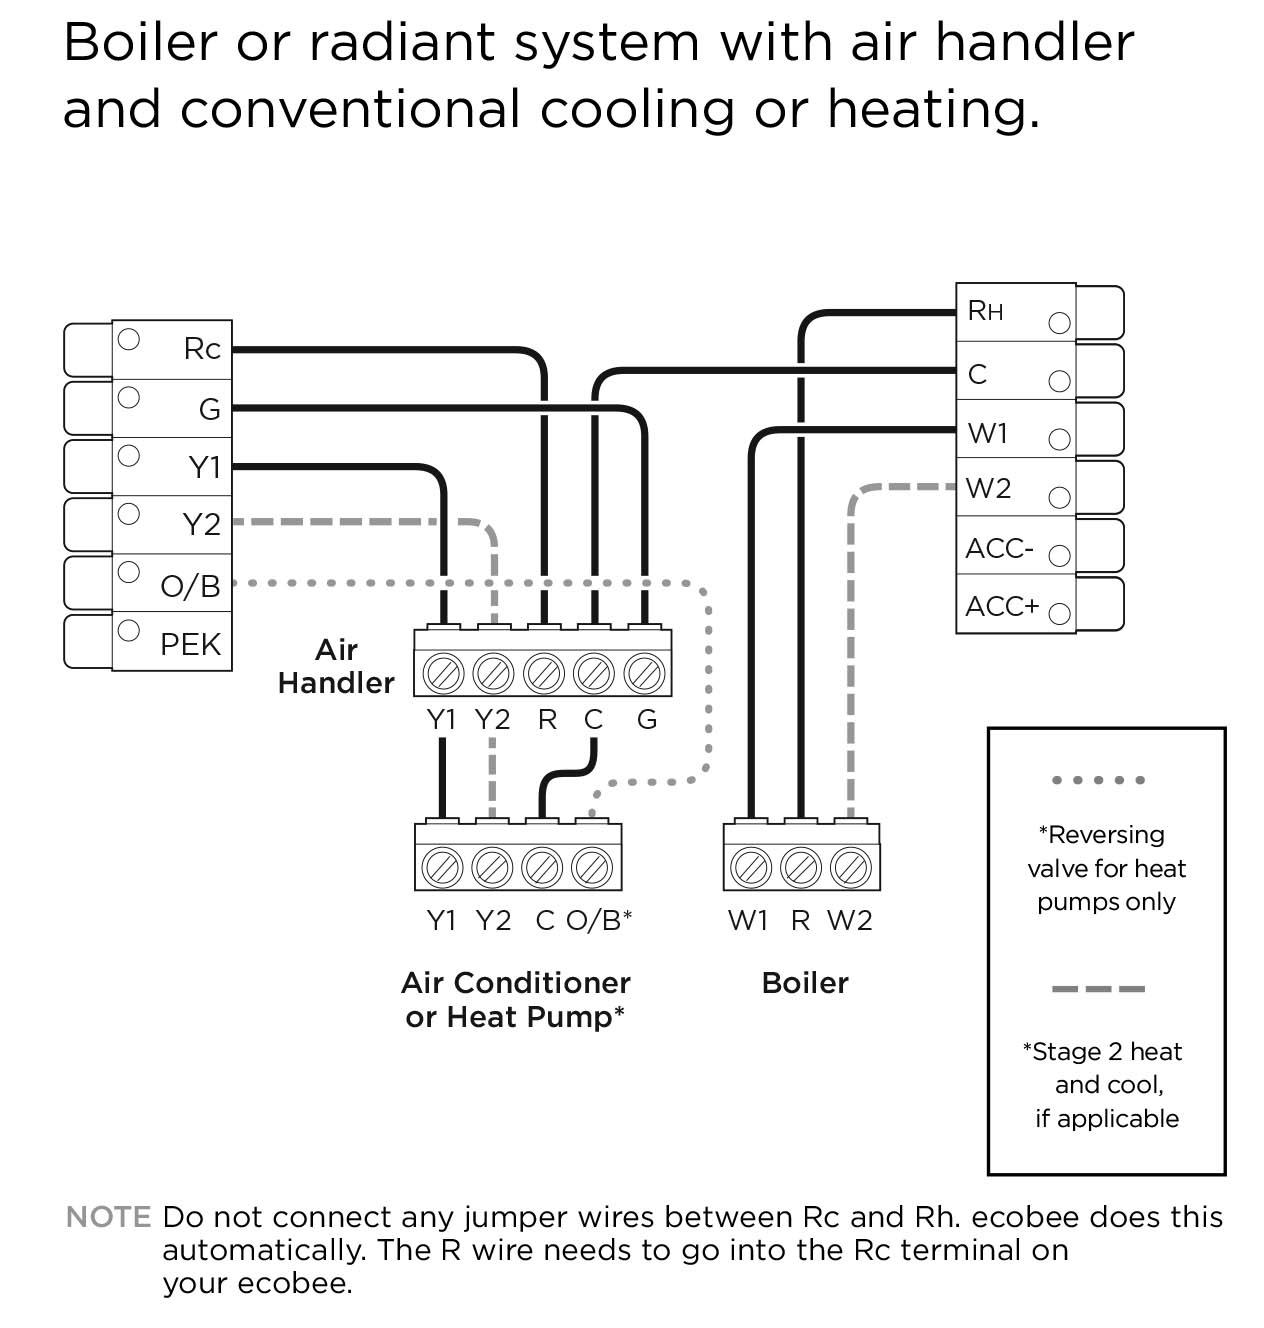 Ecobee4 Wiring Diagrams – Ecobee Support - Heat Pump Wiring Diagram